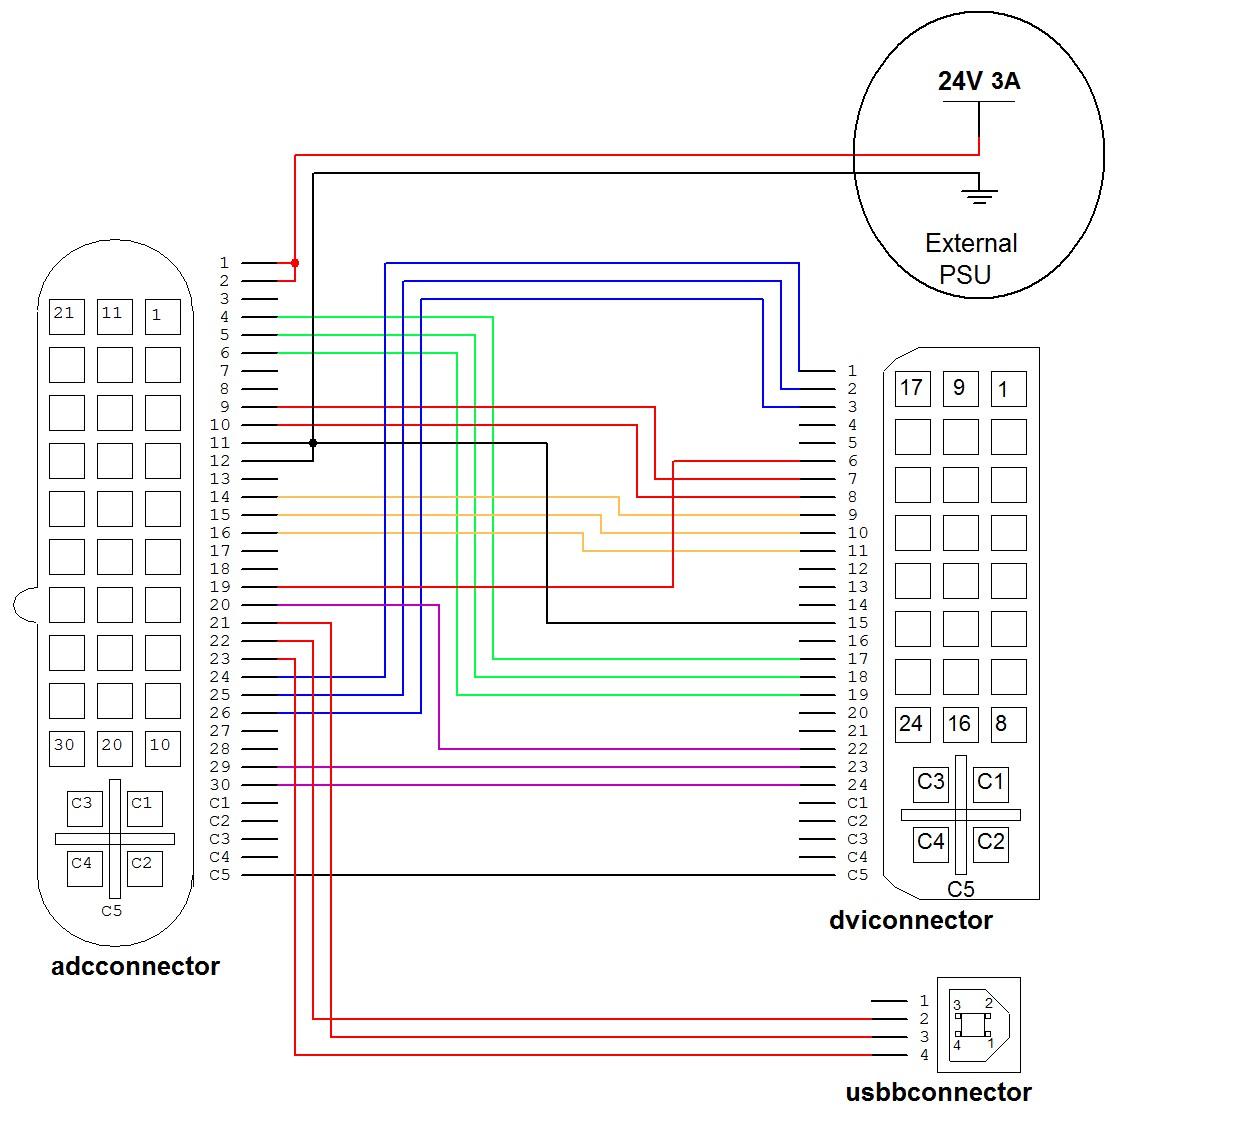 Hdmi Pin Diagram - Meta Wiring Diagrams Usb To Hdmi Wiring Diagram Color Code on